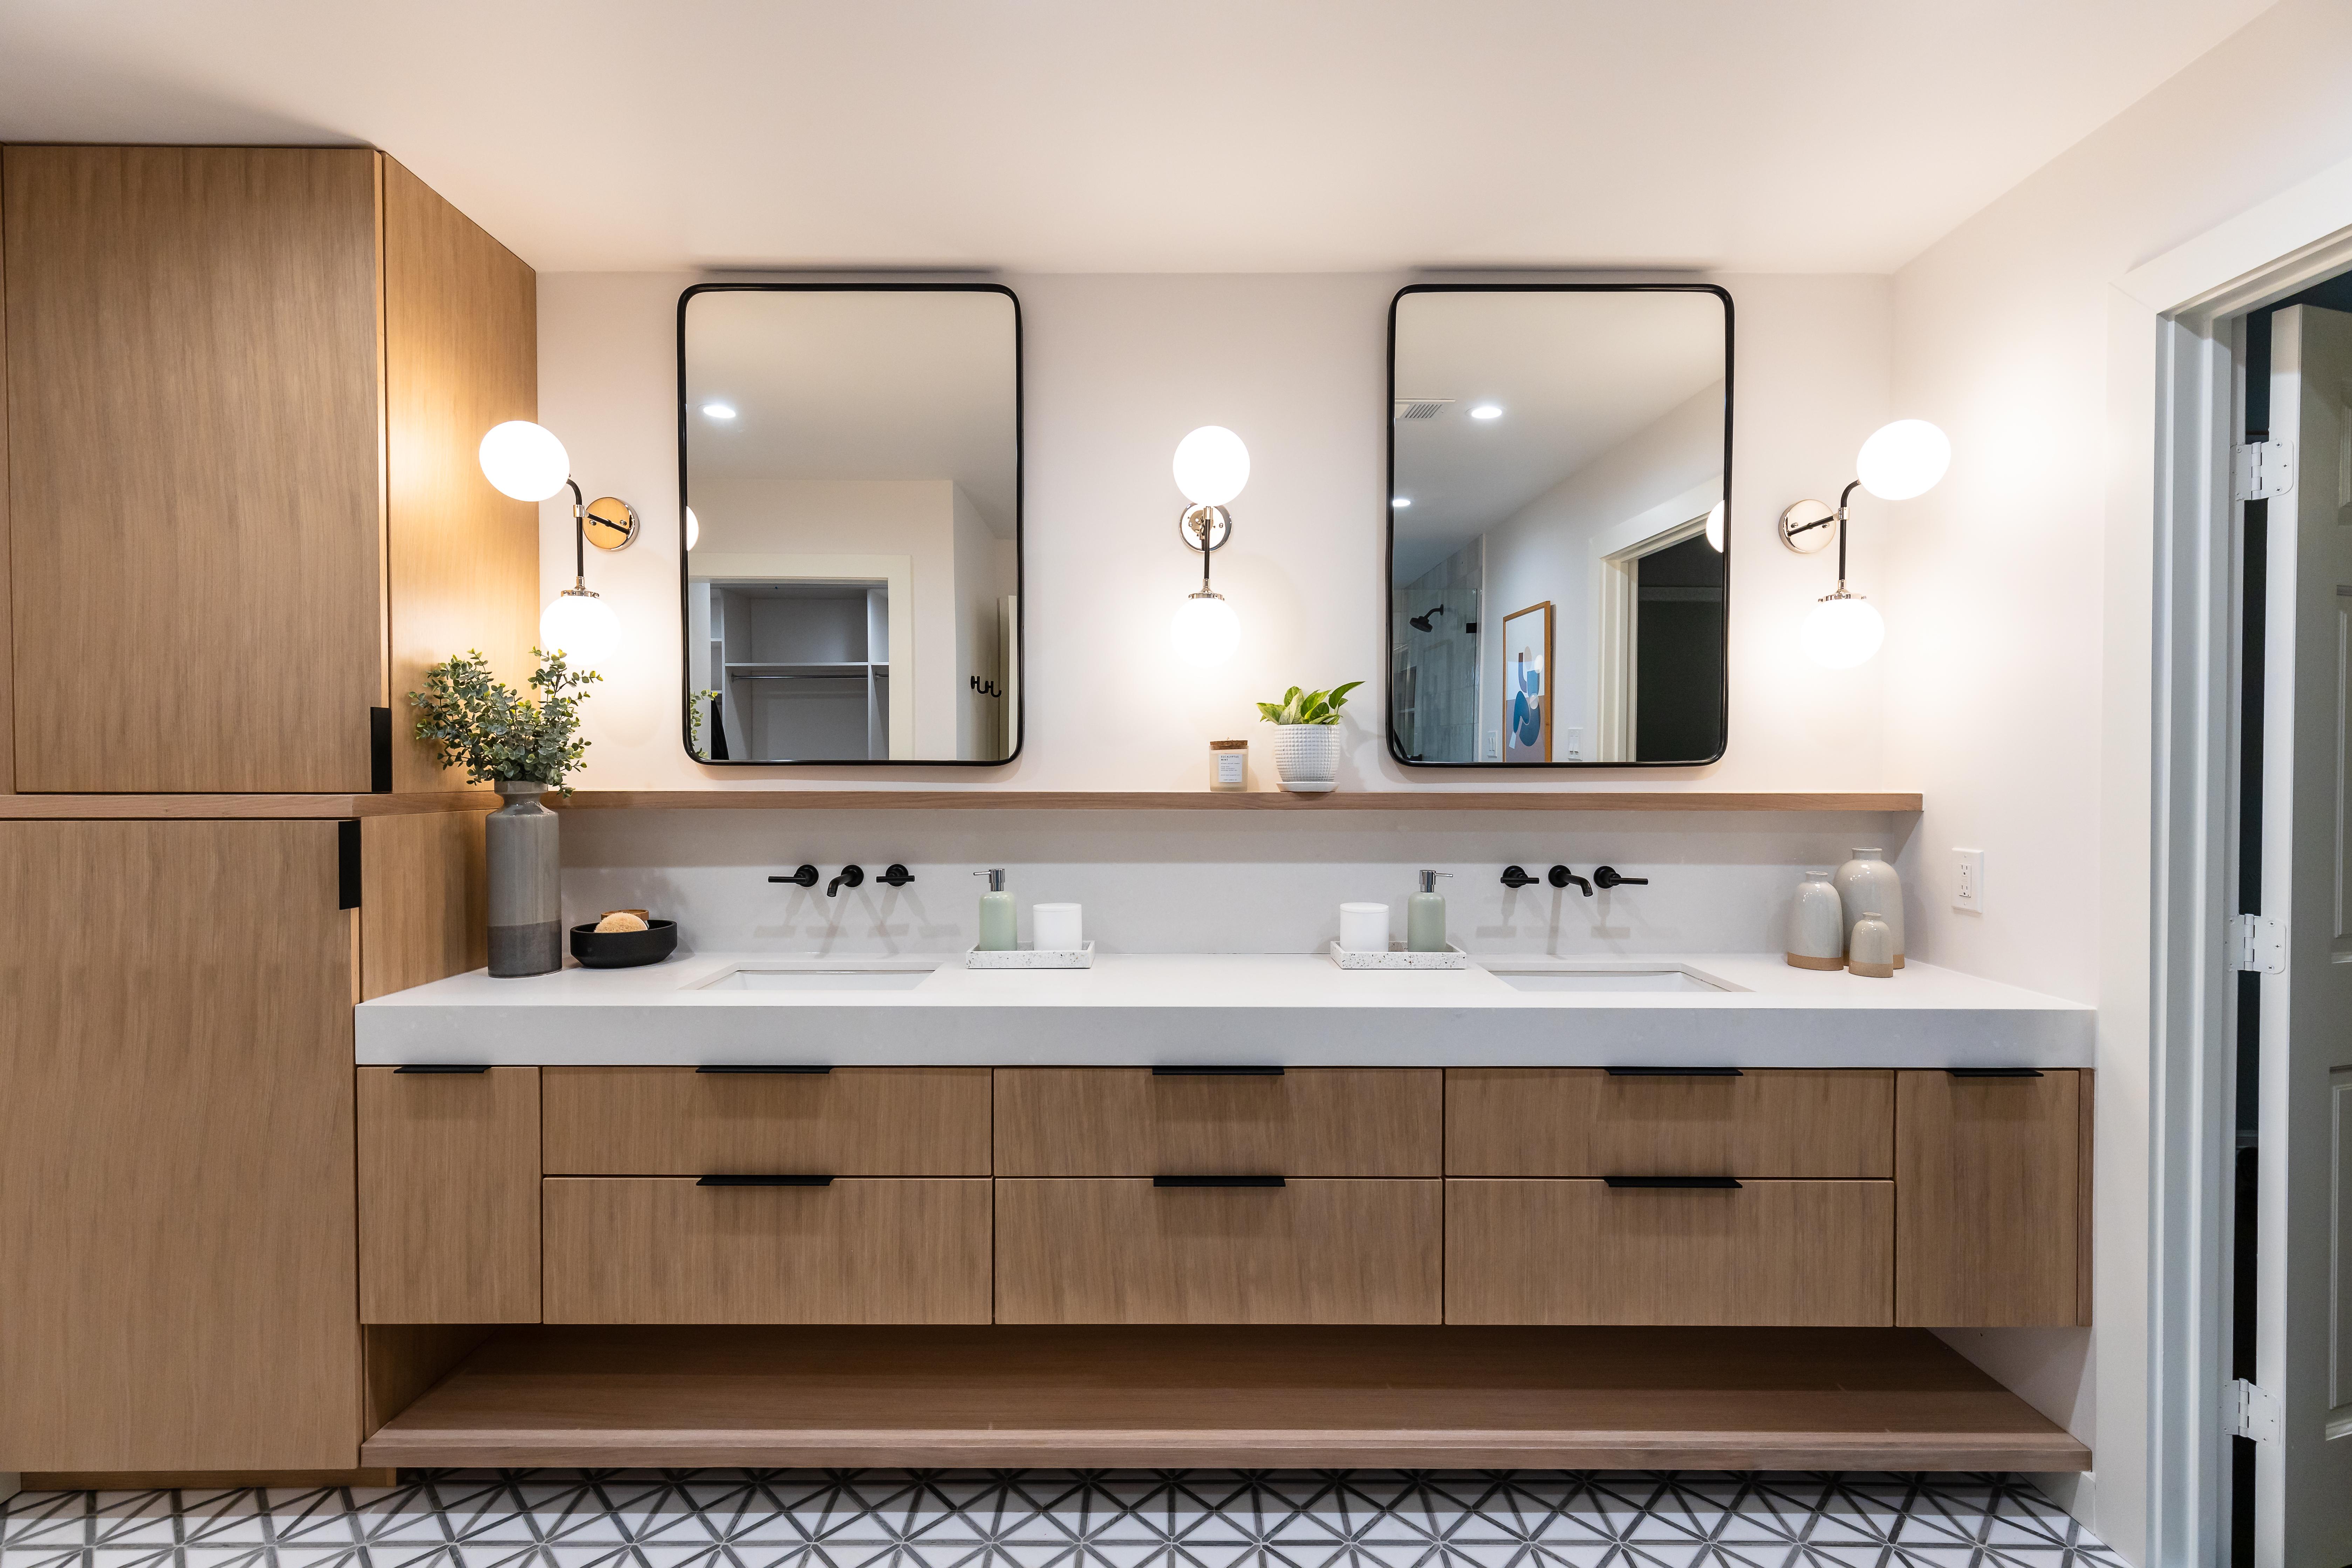 Caulfield Master Bathroom Remodel